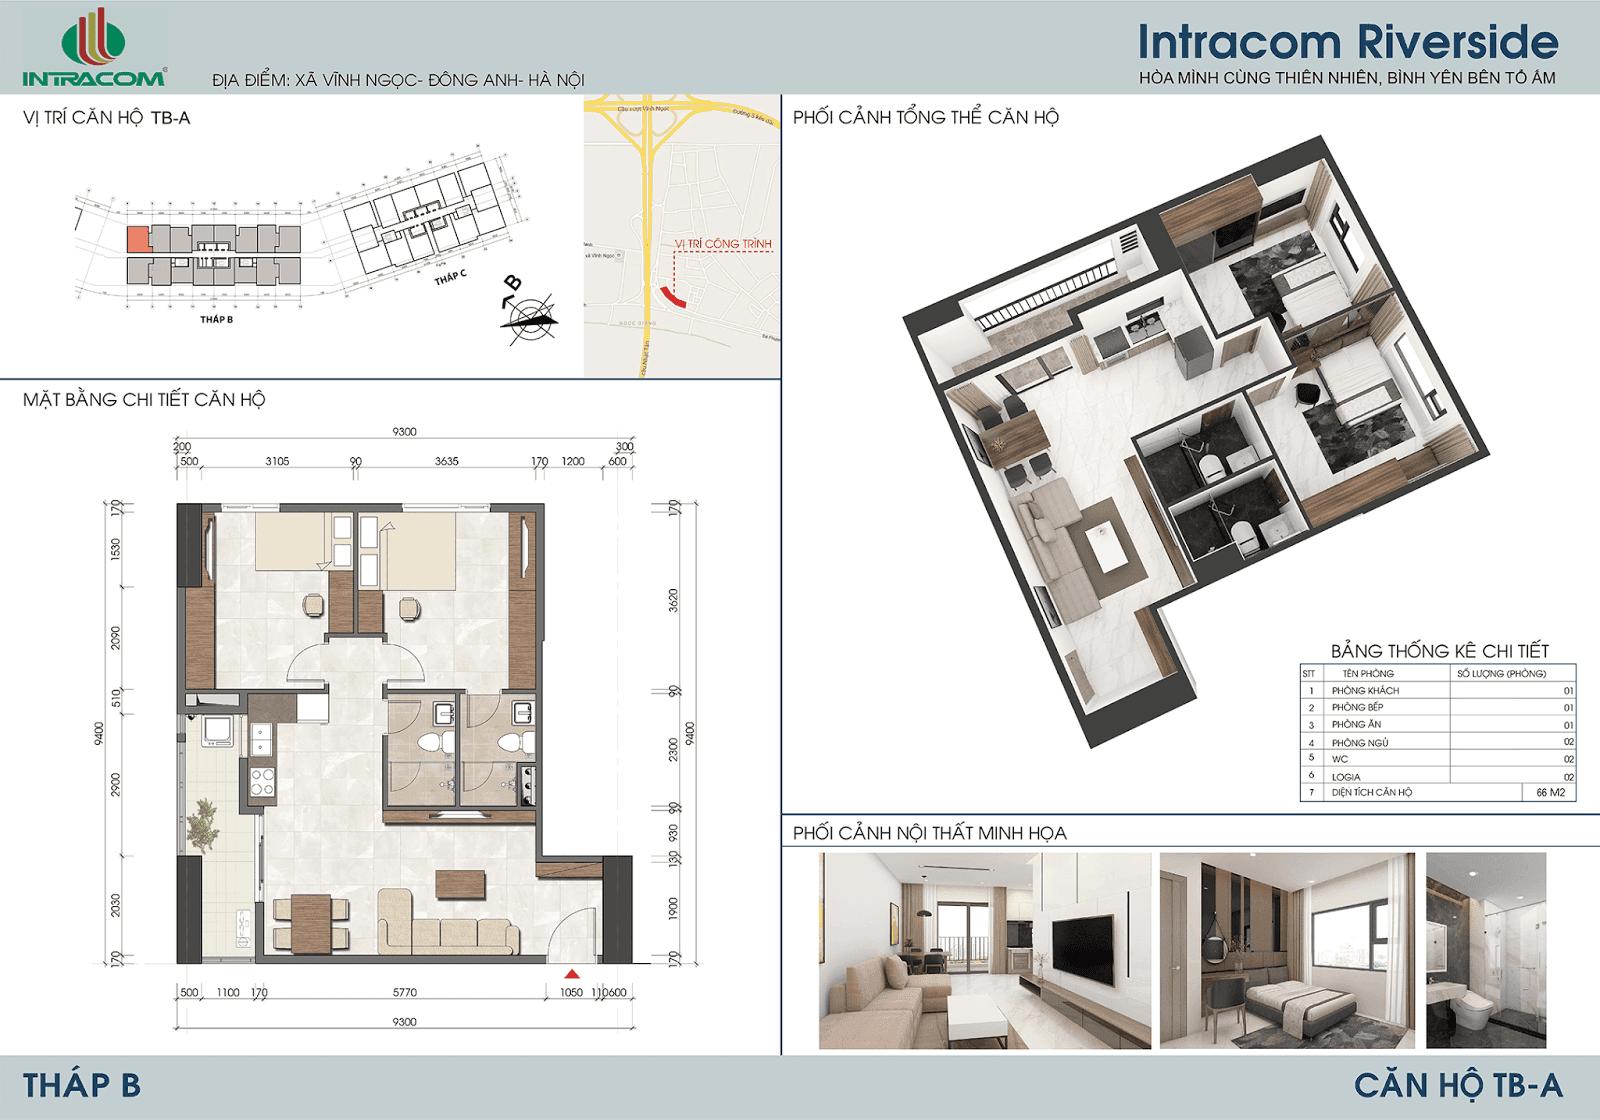 Thiết kế căn 01 - 08 - 09 - 16 - 66m2